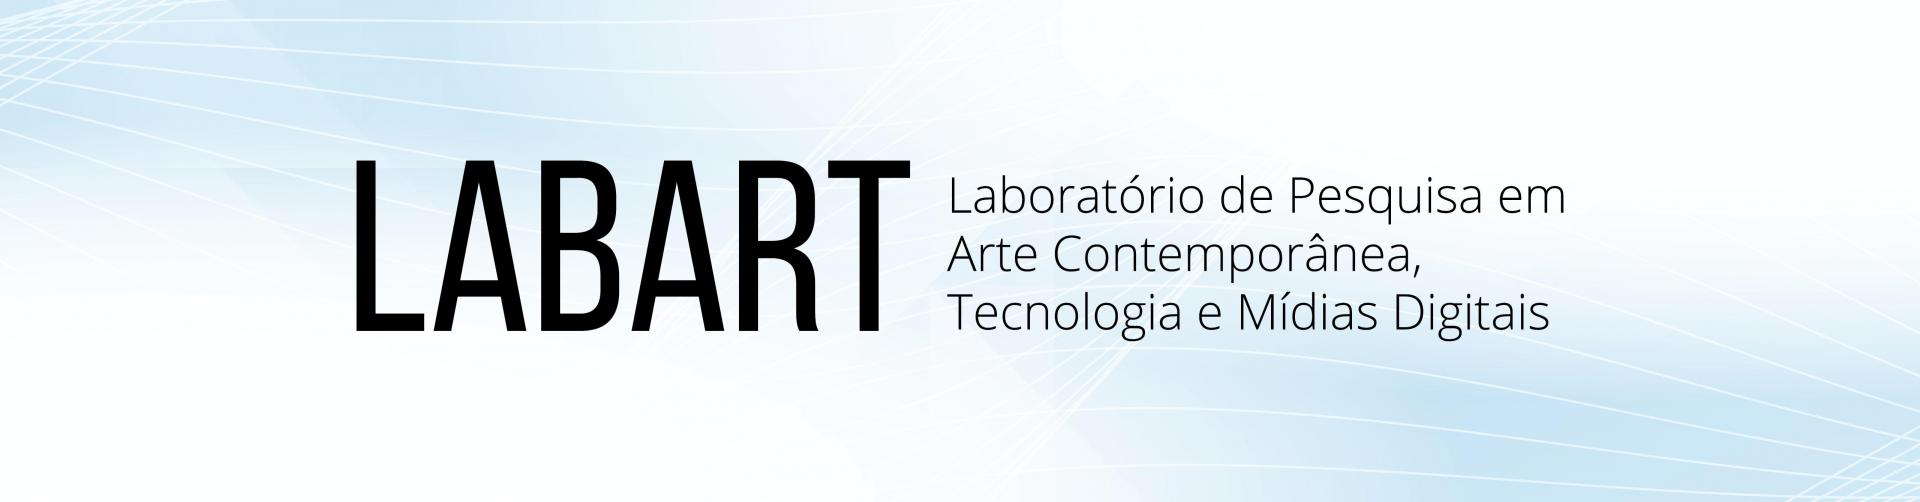 LABART_LABORATORIO